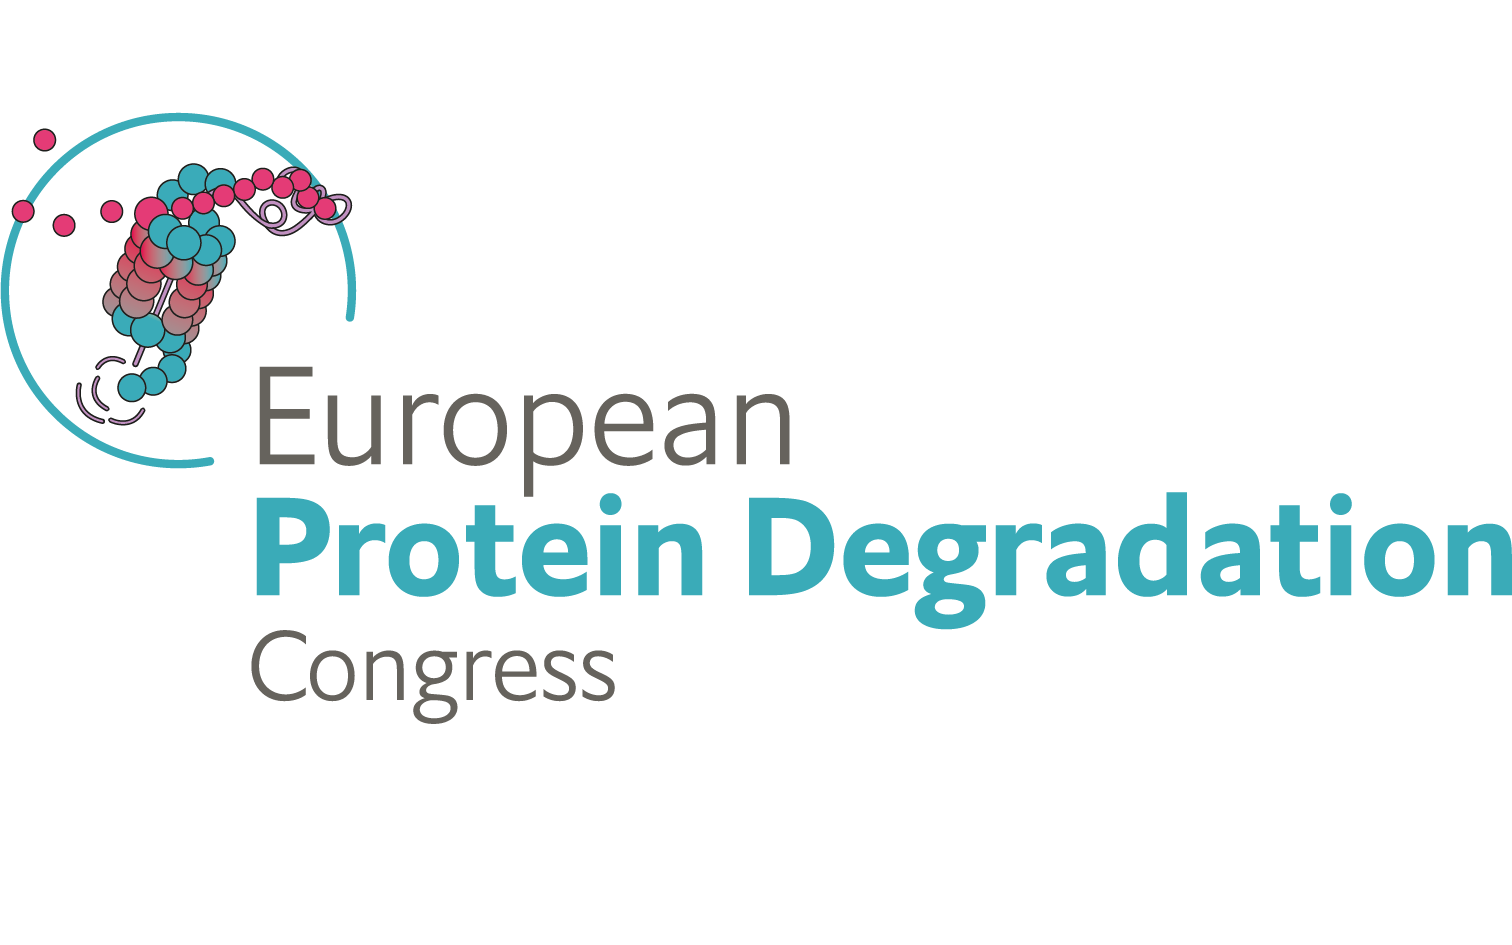 European Protein Degradation Congress 2021